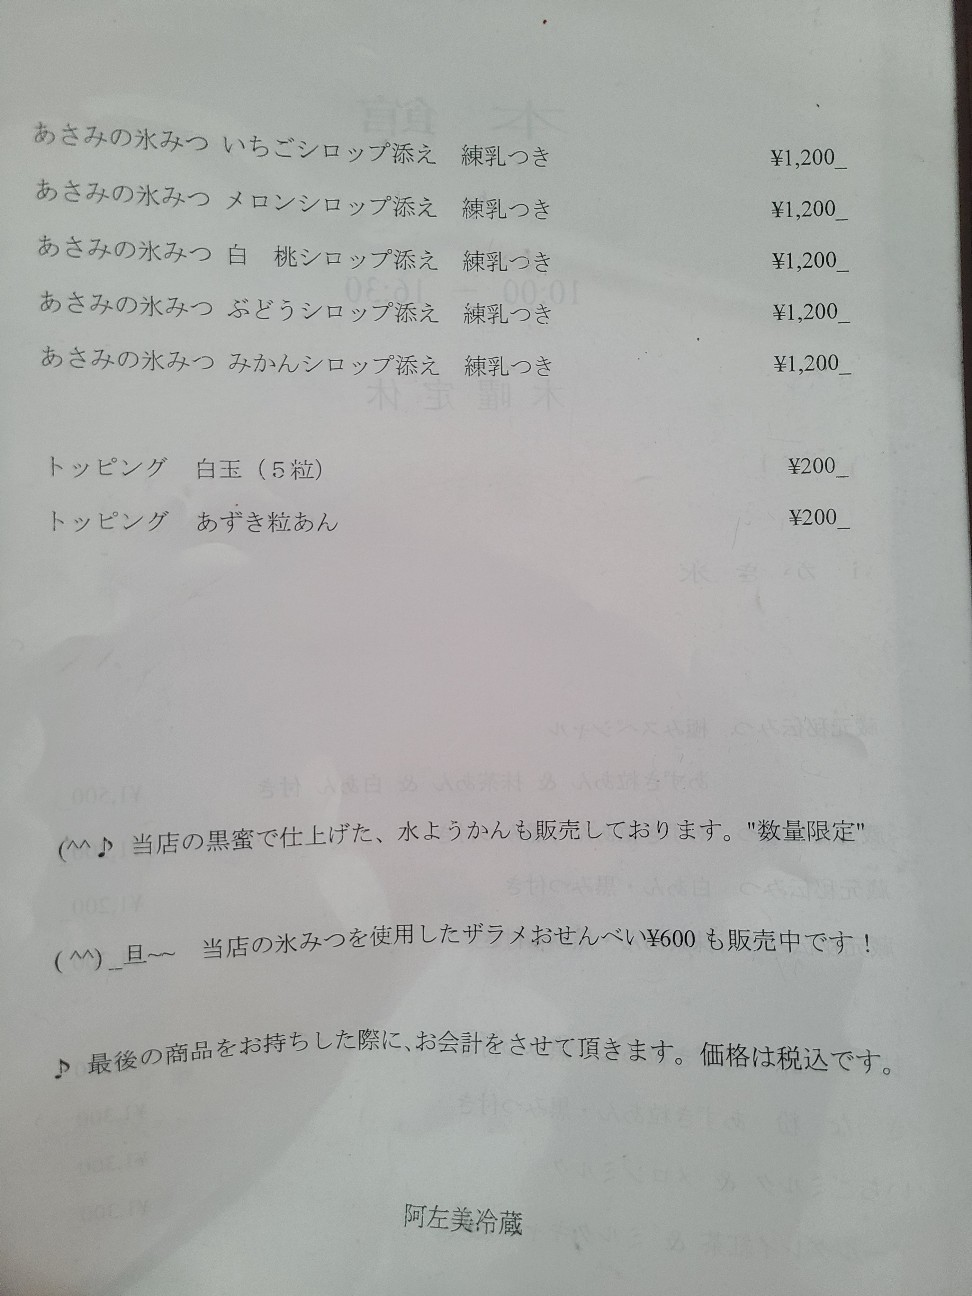 f:id:tt-suzukiit:20210917162458j:image